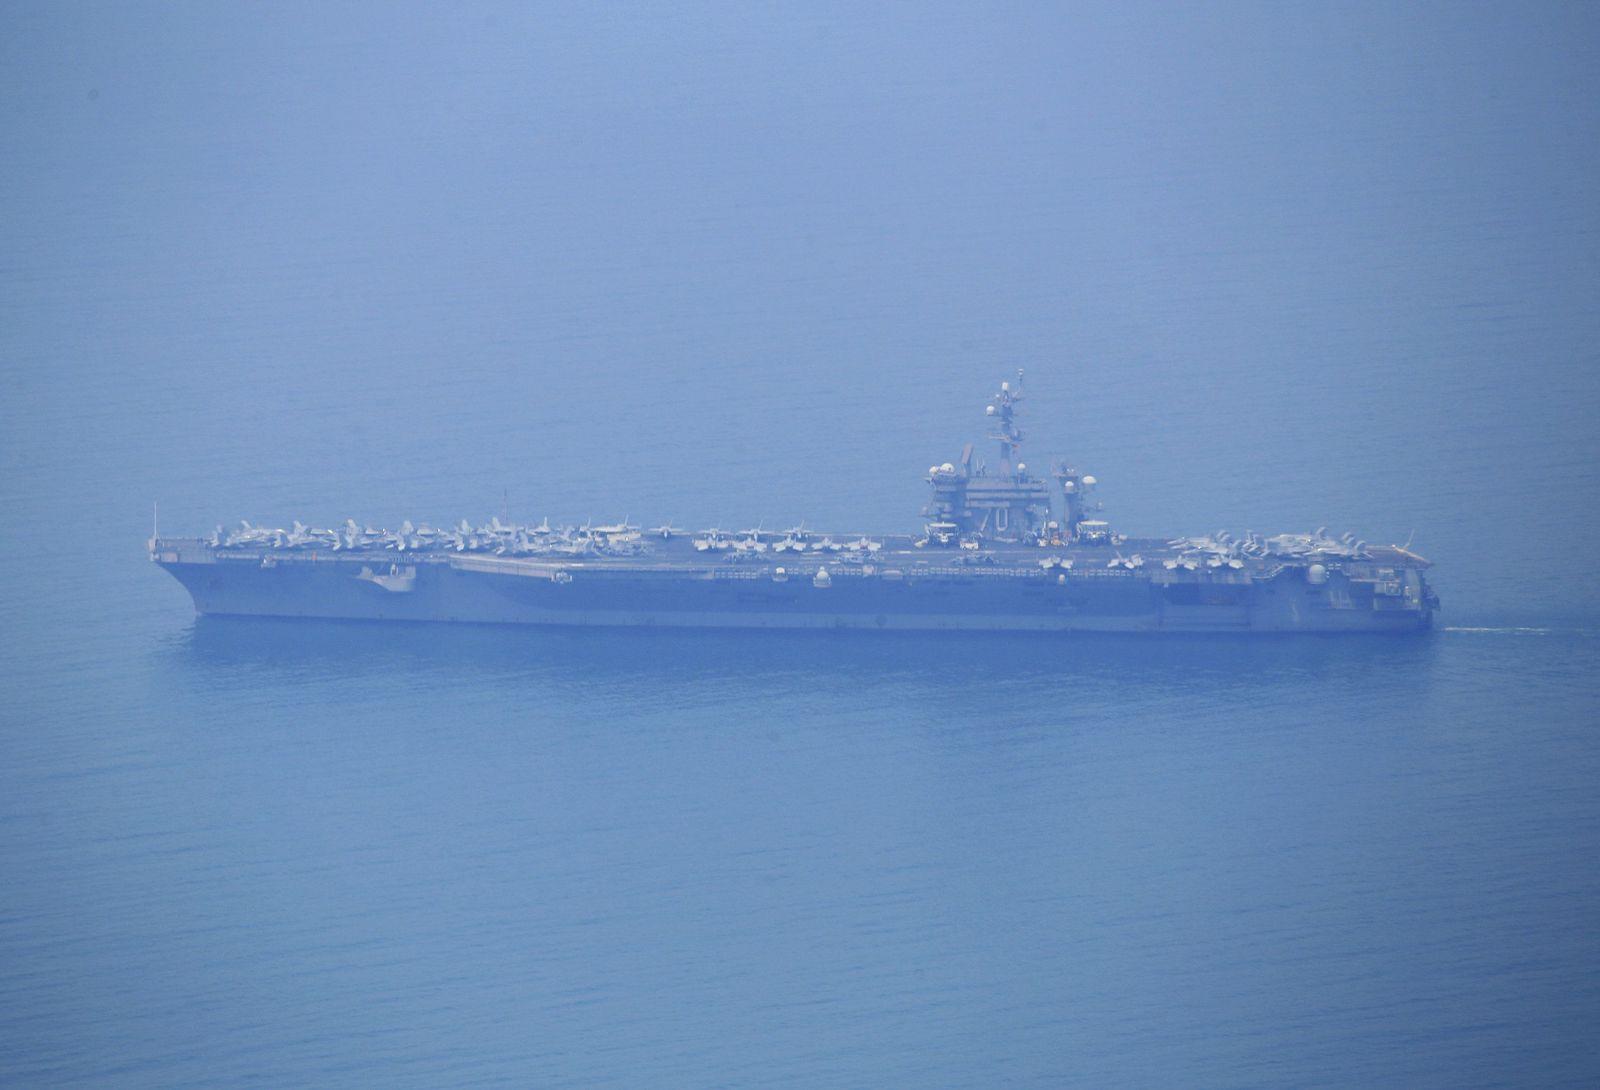 USS Carl Vinson in Vietnam